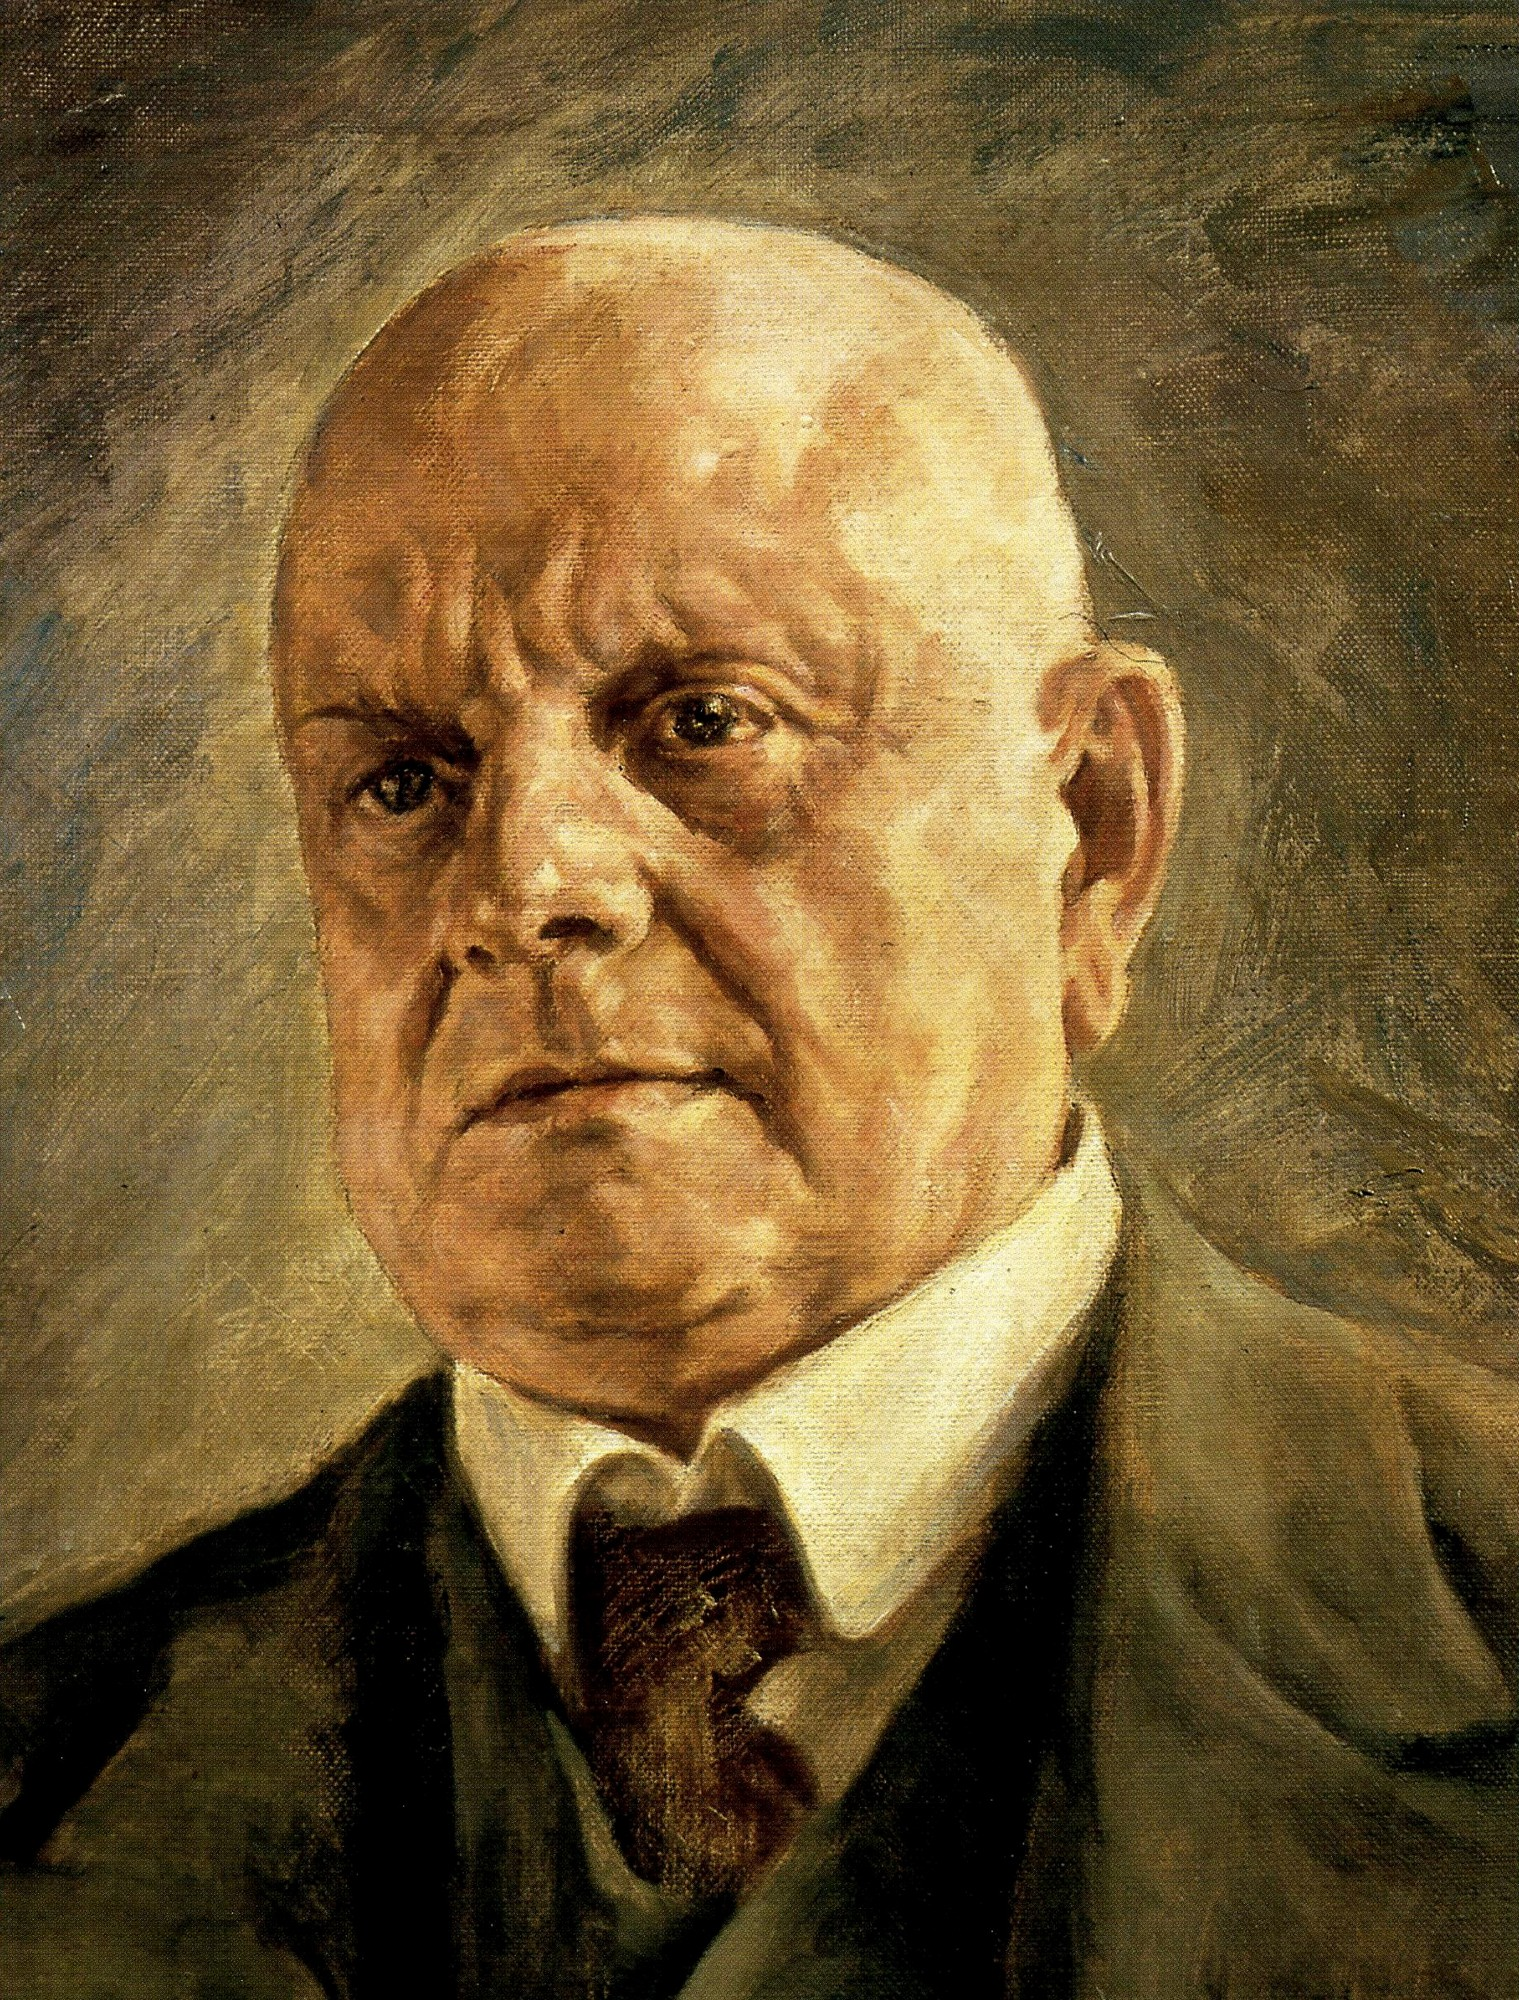 Ян Сибелиус (1865-1957), финский композитор